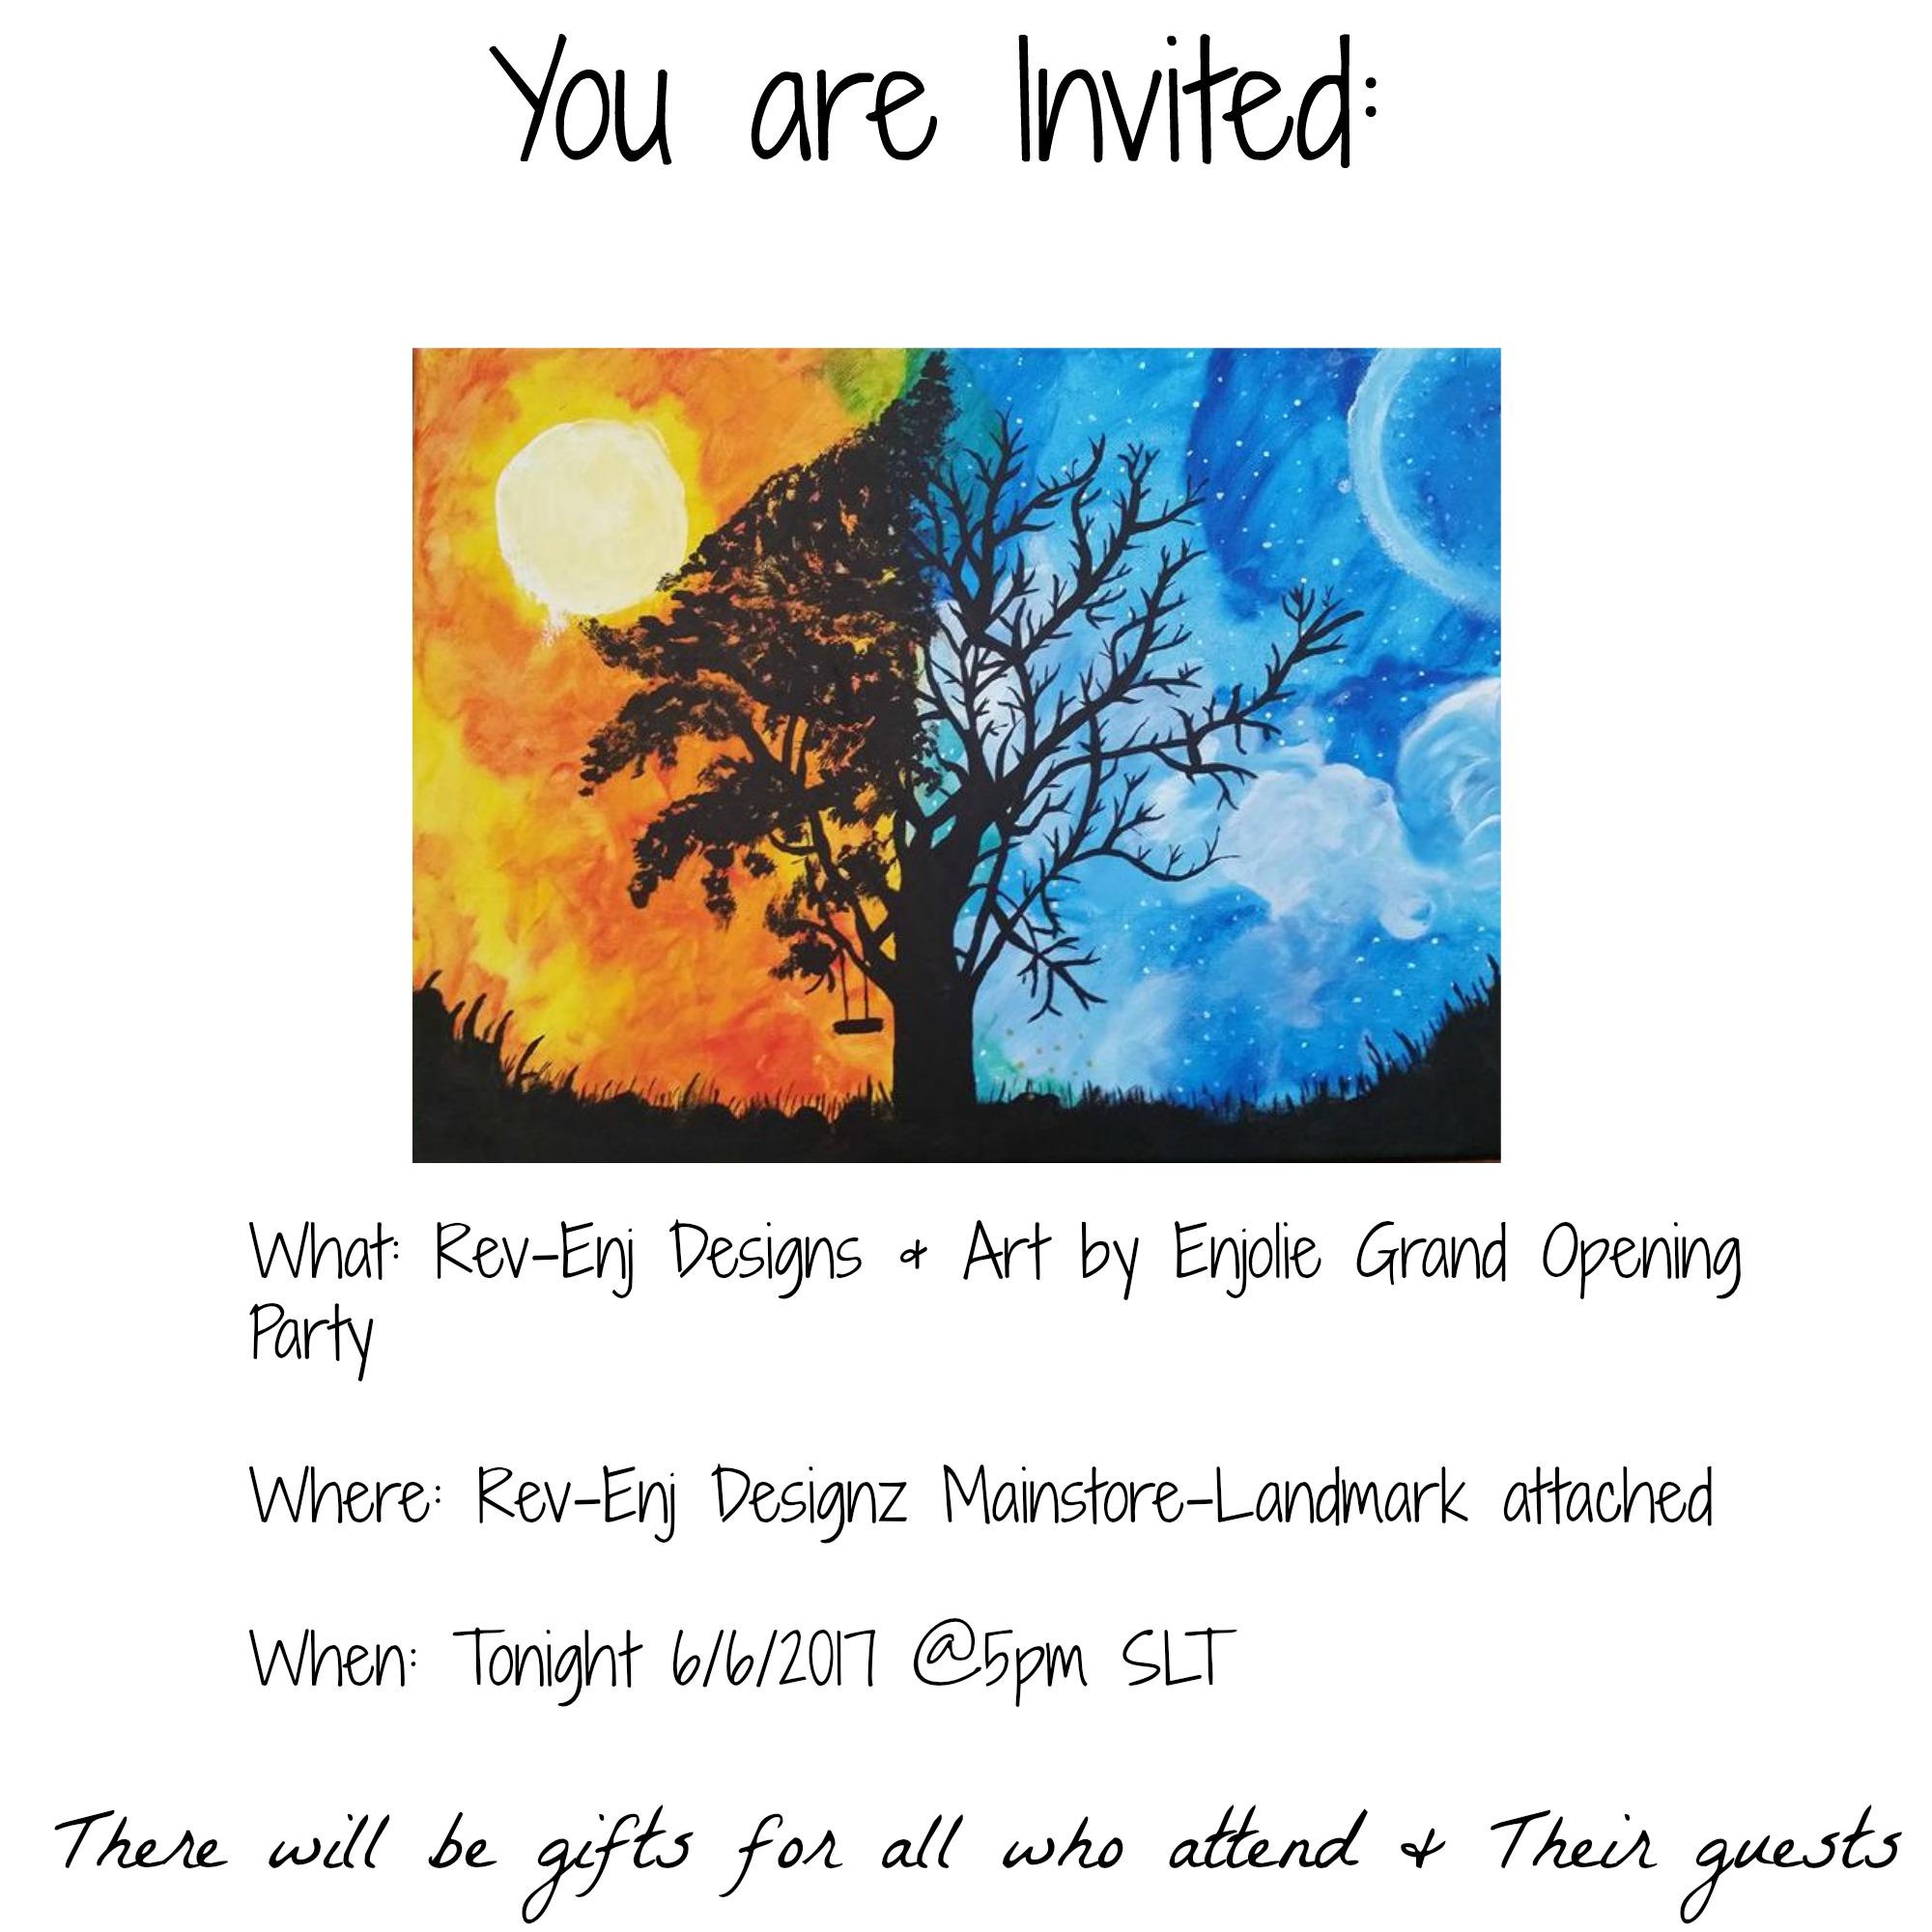 Uncategorized Enjolie art by enjolie grand opening party tonight 5pmslt 8pmslt artbyenjolieinviteopeningparty jpg